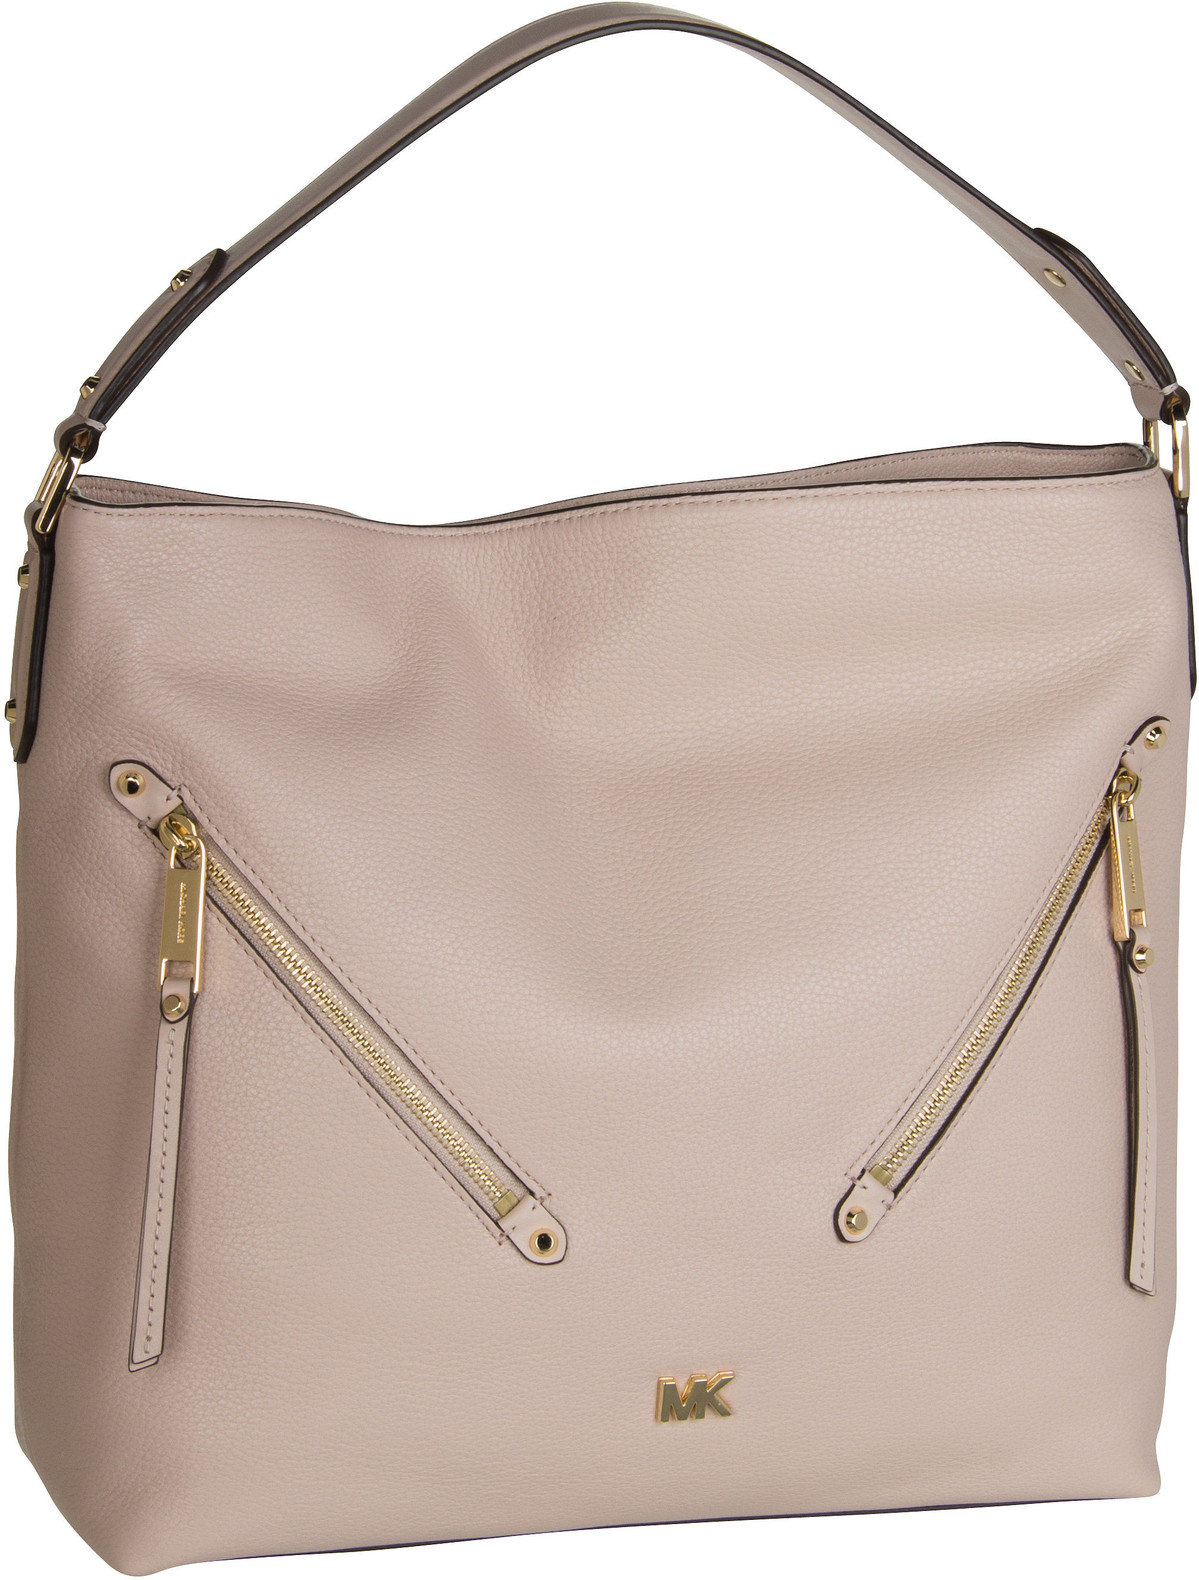 Michael Kors Handtasche Evie Large Hobo Soft Pink